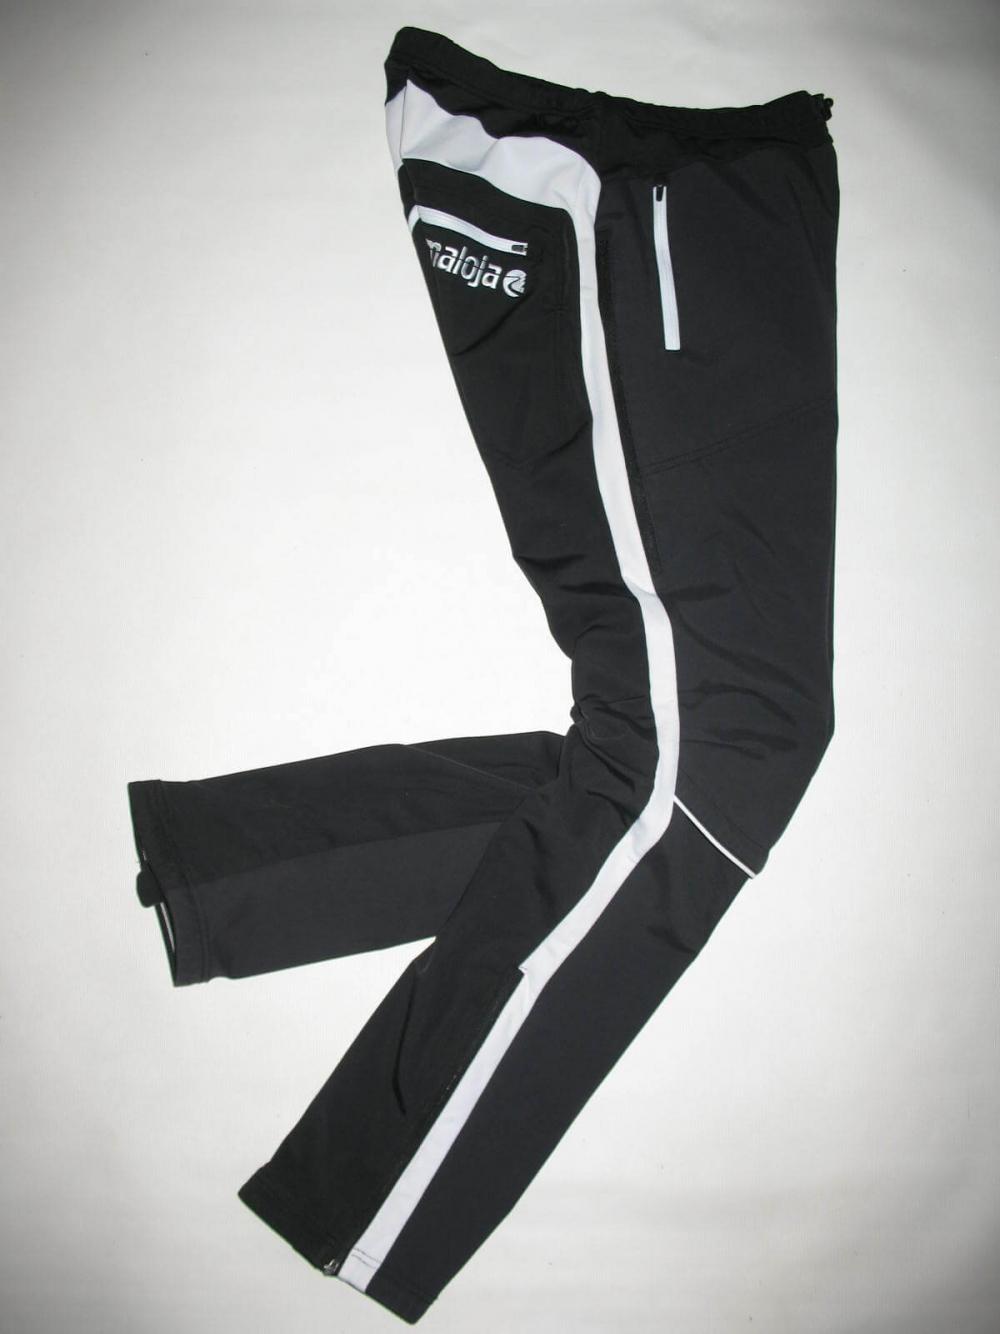 Велобрюки MALOJA sacha softshell pants (размер XL) - 6